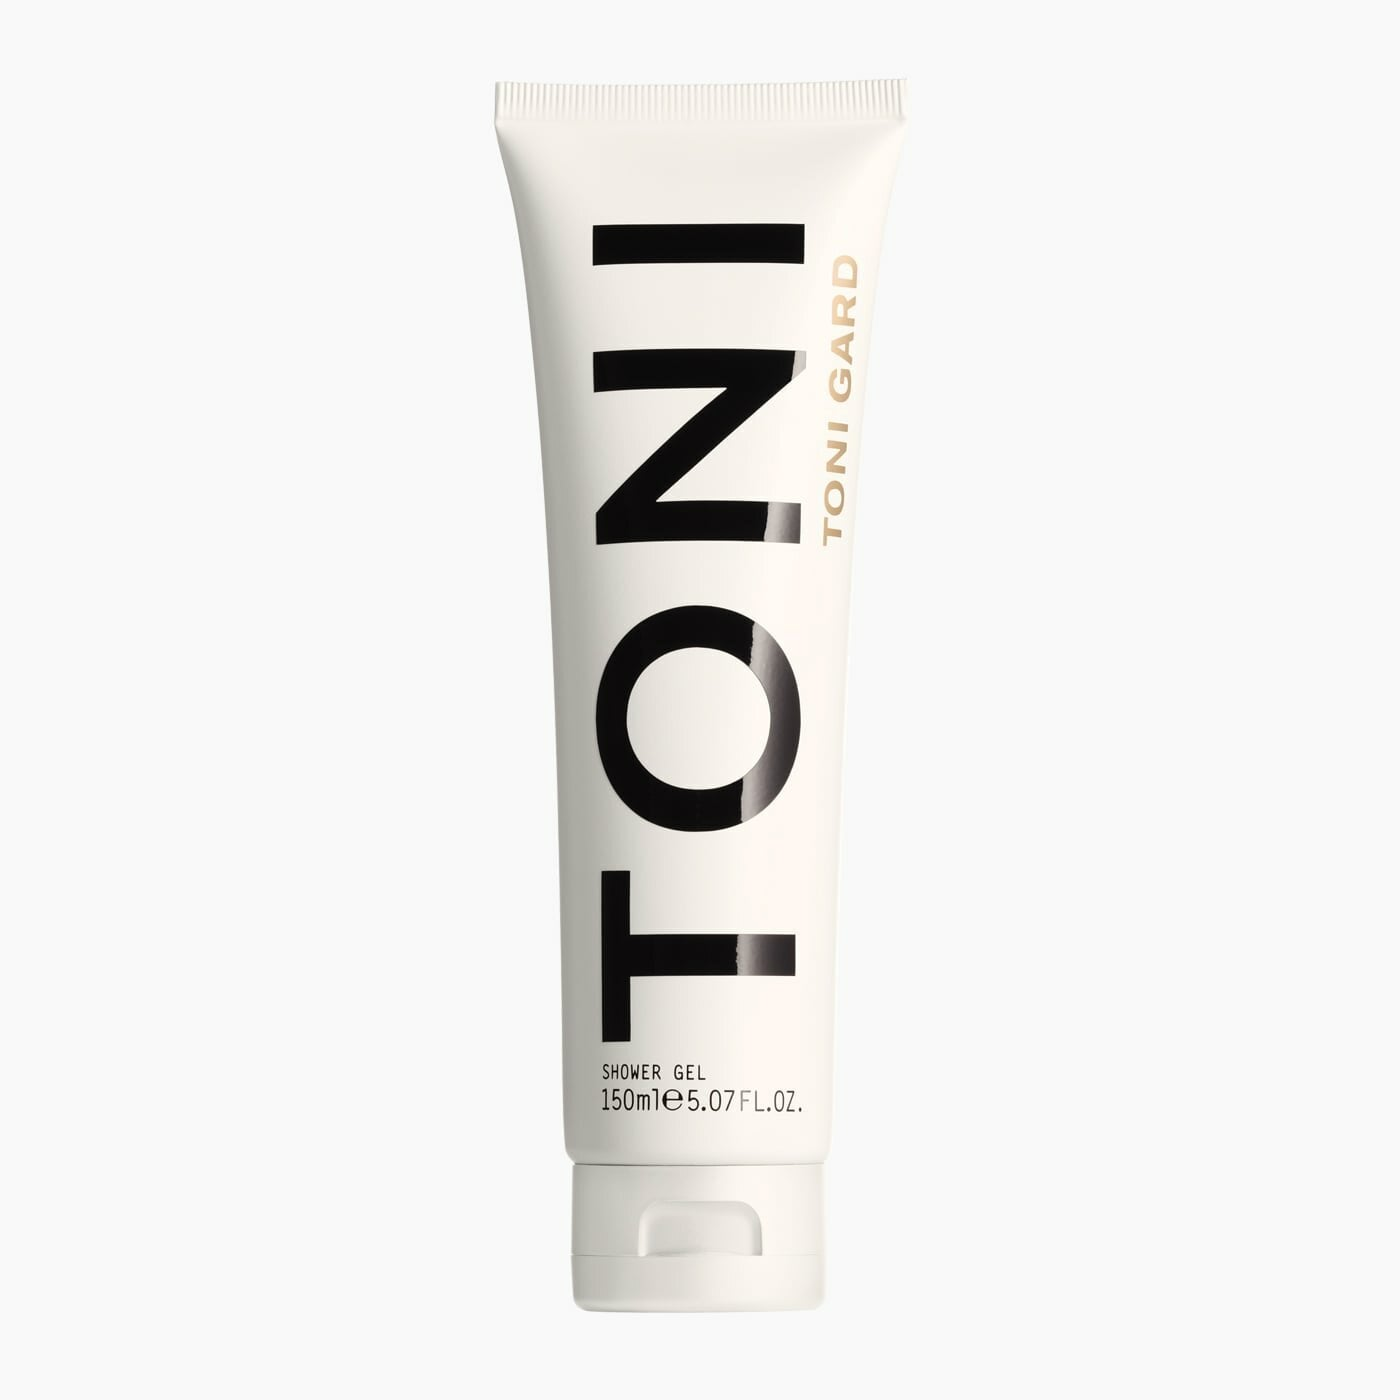 TONI FOR WOMAN Shower Gel / 150 ML